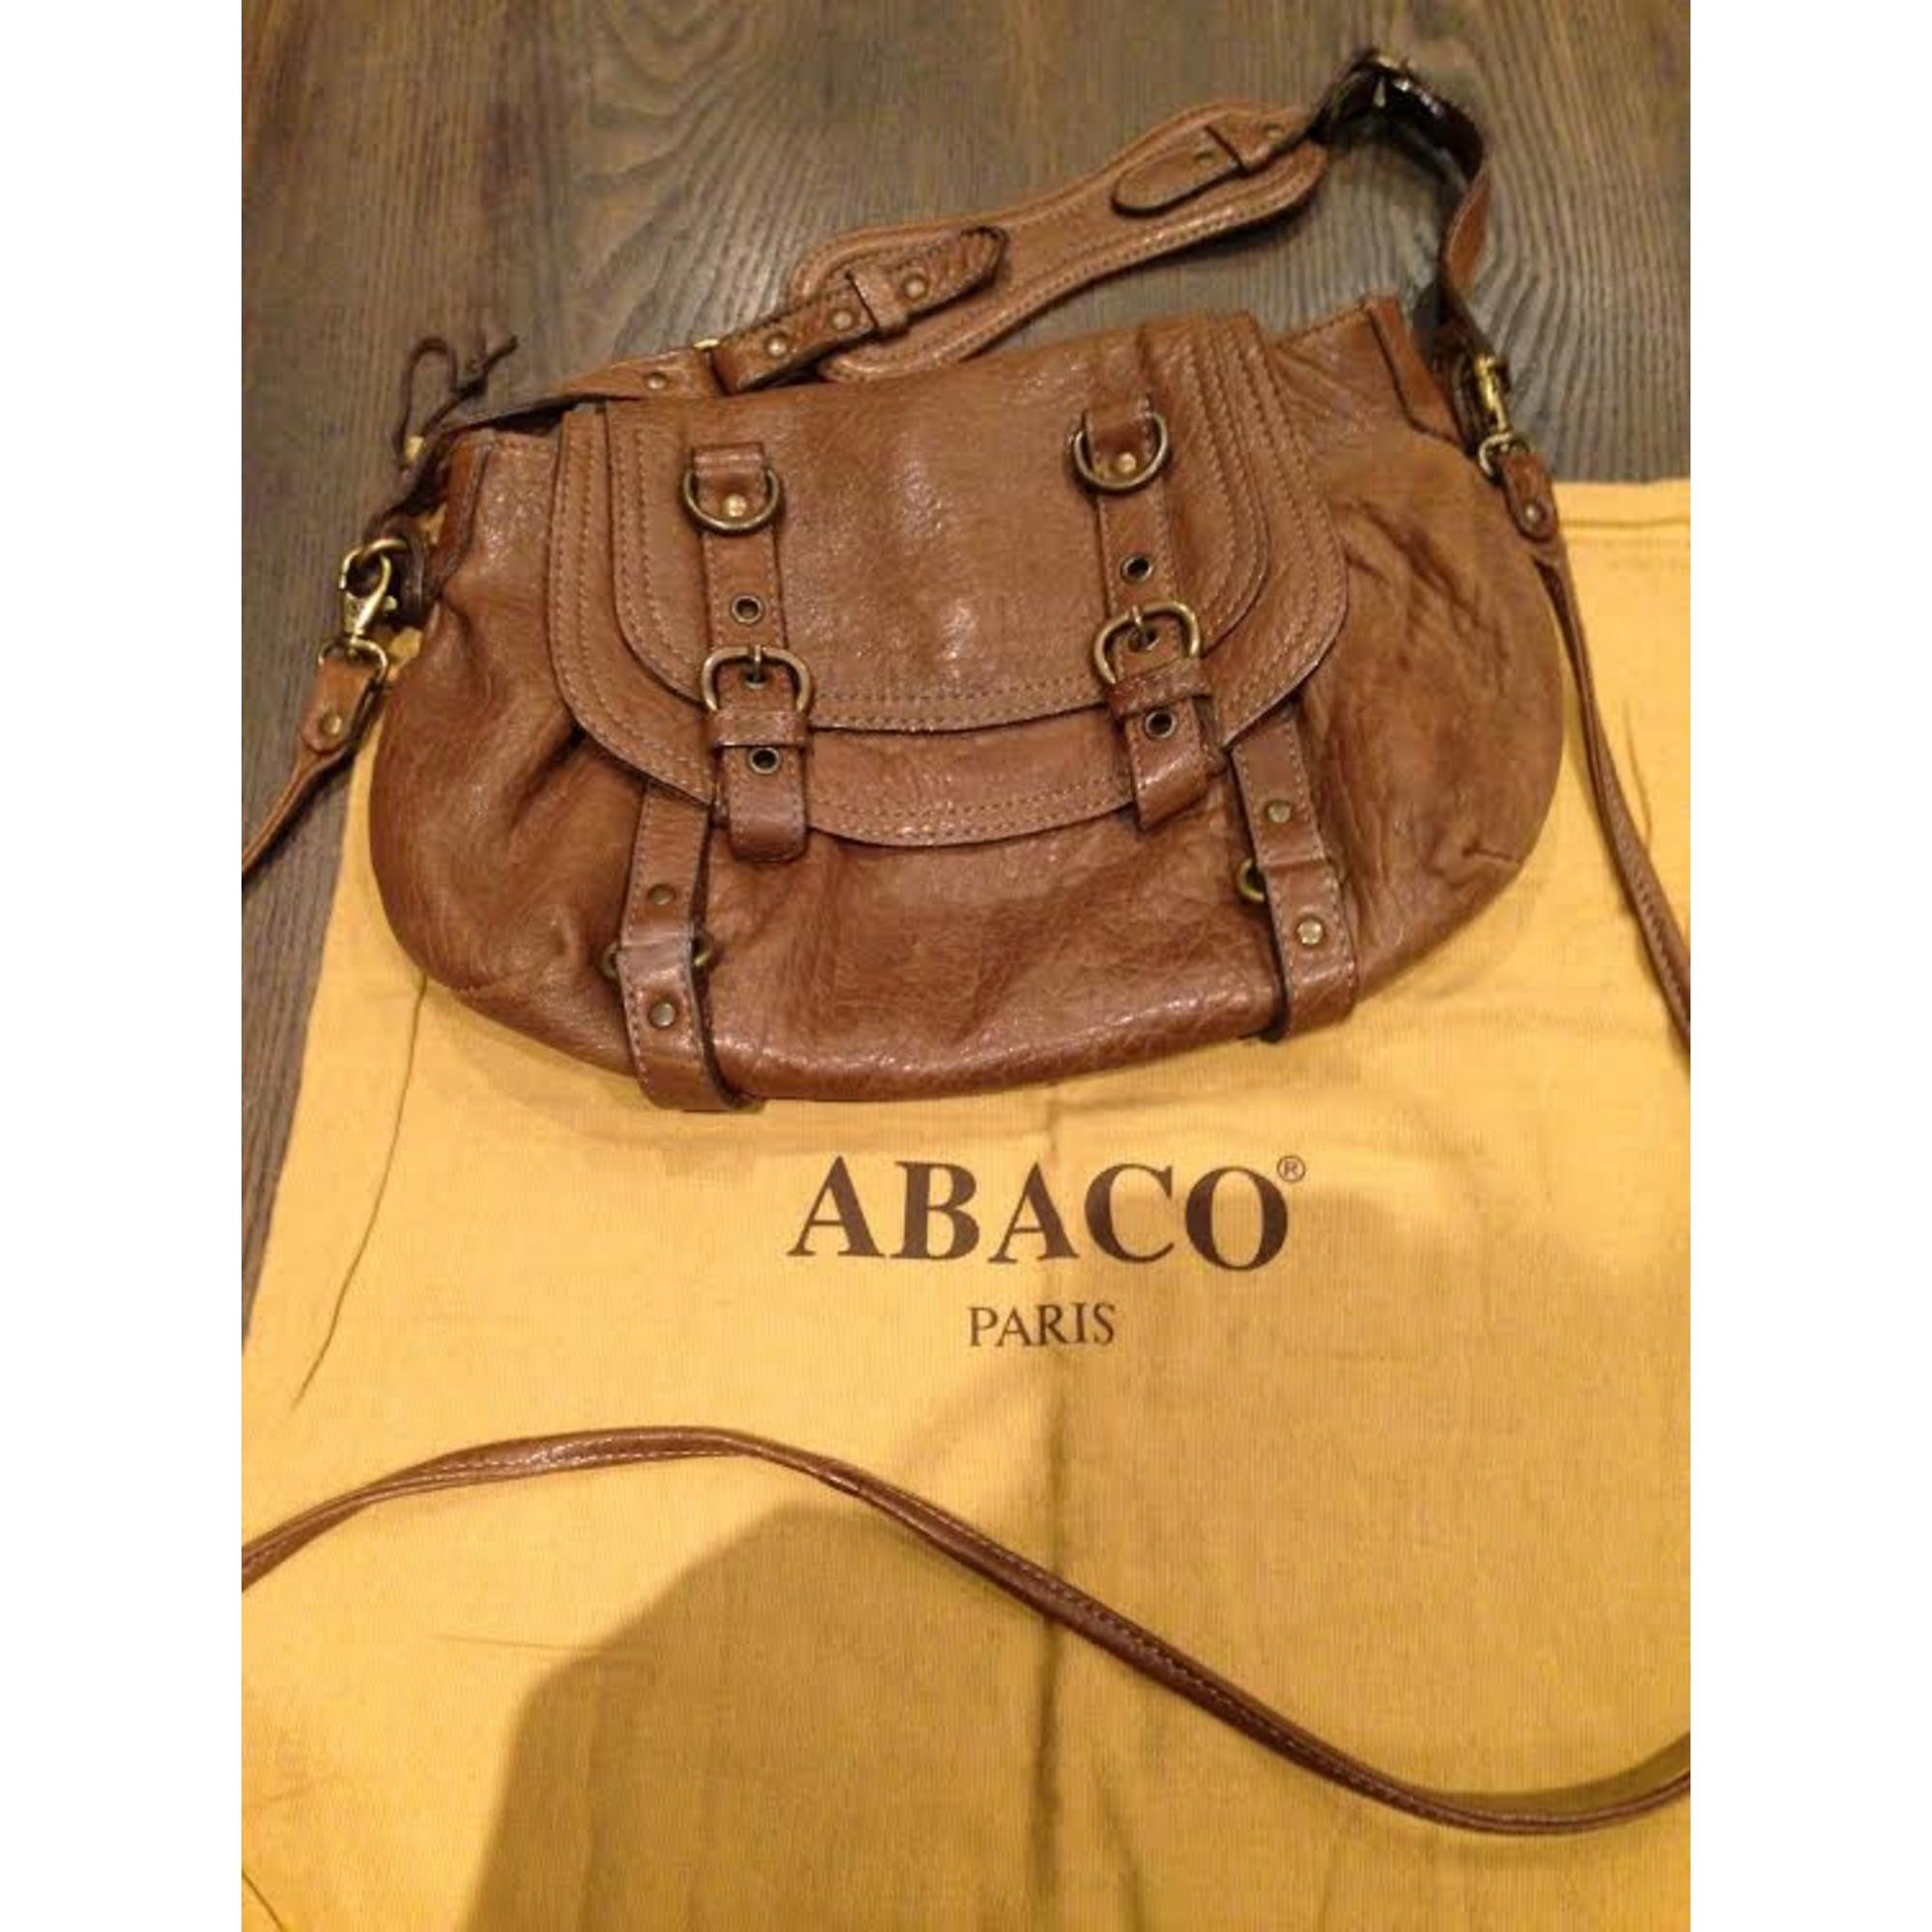 Abaco O Beige mag Cuir En 2134008 Sac Par Vendu by Bandoulière rdxBeCWoQ